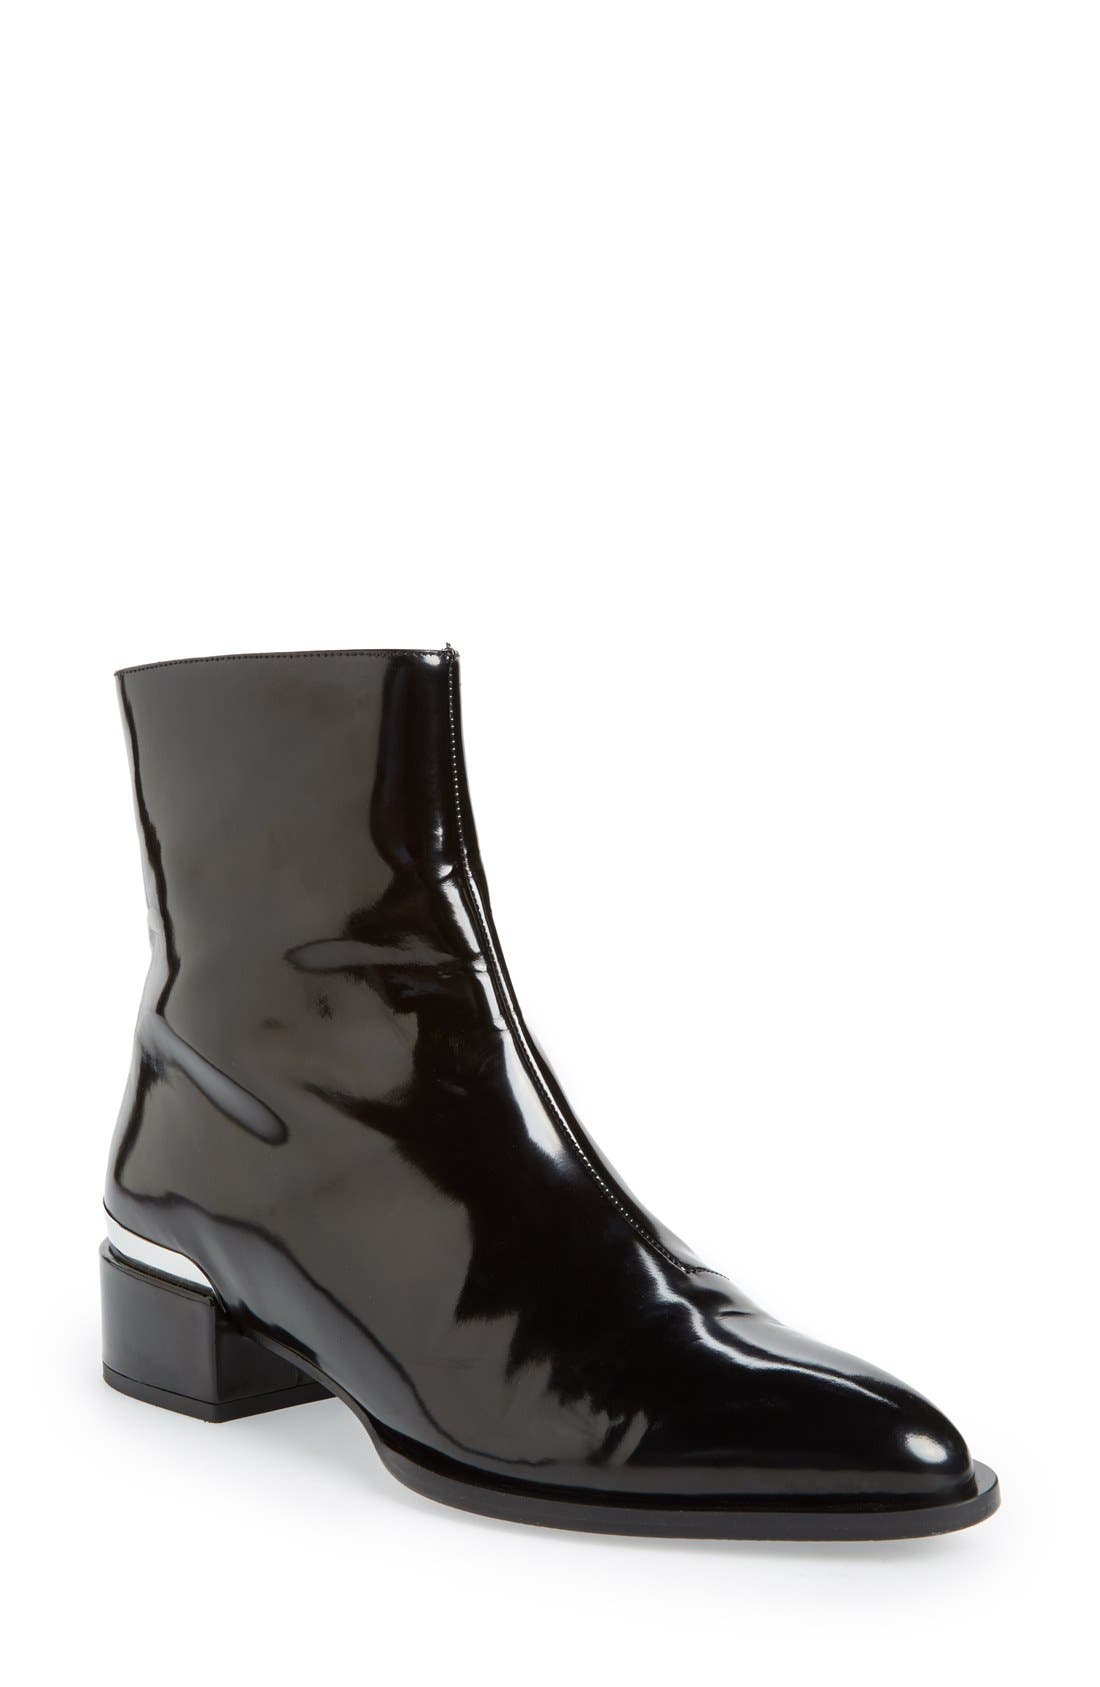 'Yasmin' Pointy Toe Boot,                             Main thumbnail 1, color,                             001